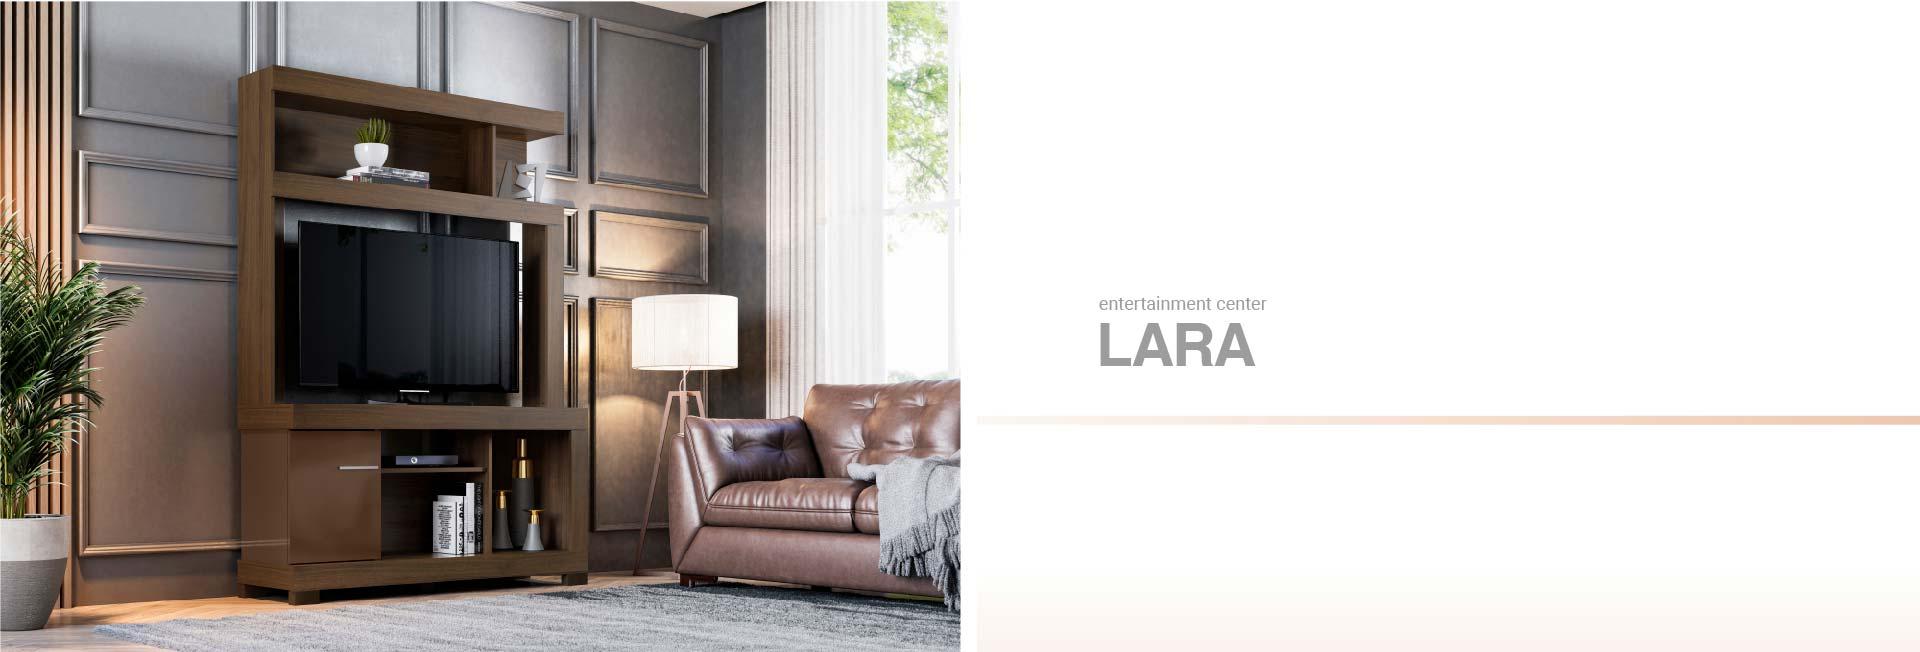 Lara Entertainment Center